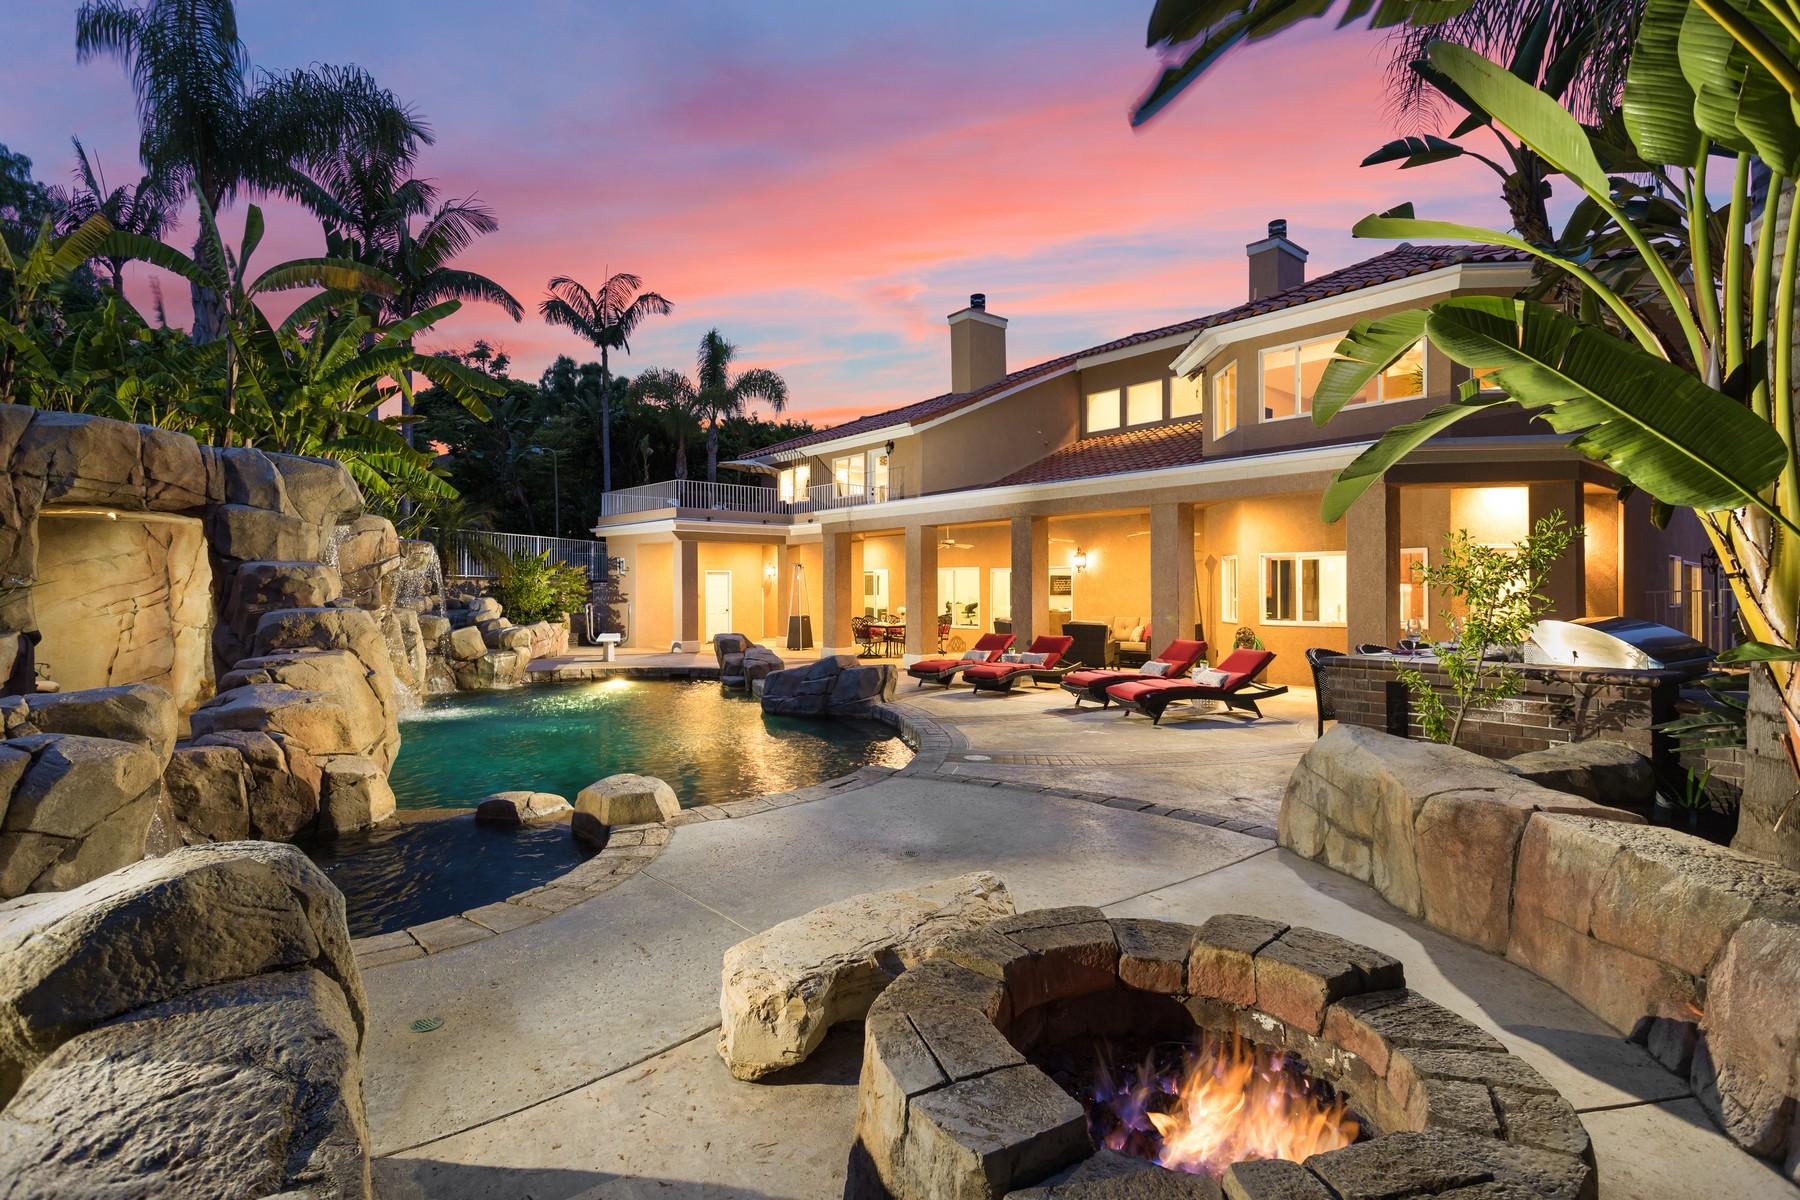 Single Family Homes for Sale at 26031 Flintlock Ln Laguna Hills, California 92653 United States